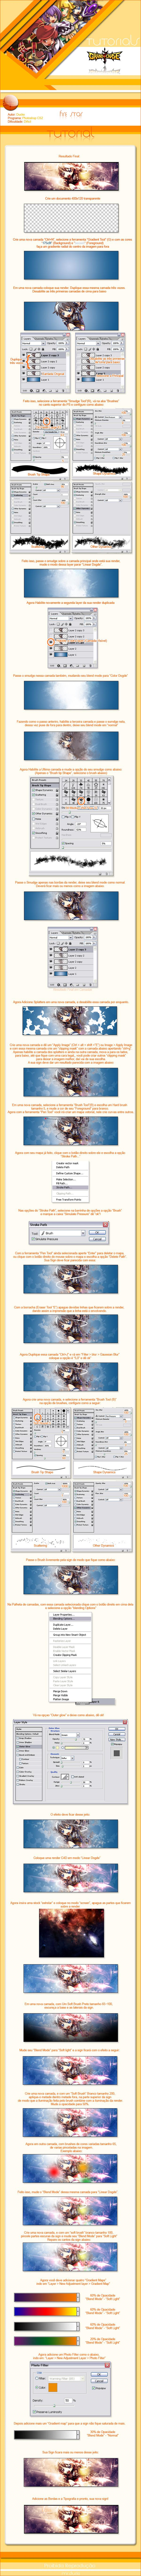 Hattori Hanzo 2.0- Galeria Tutorial_fire_star_by_spangemberg_by_arthoneceron-d4s20p4